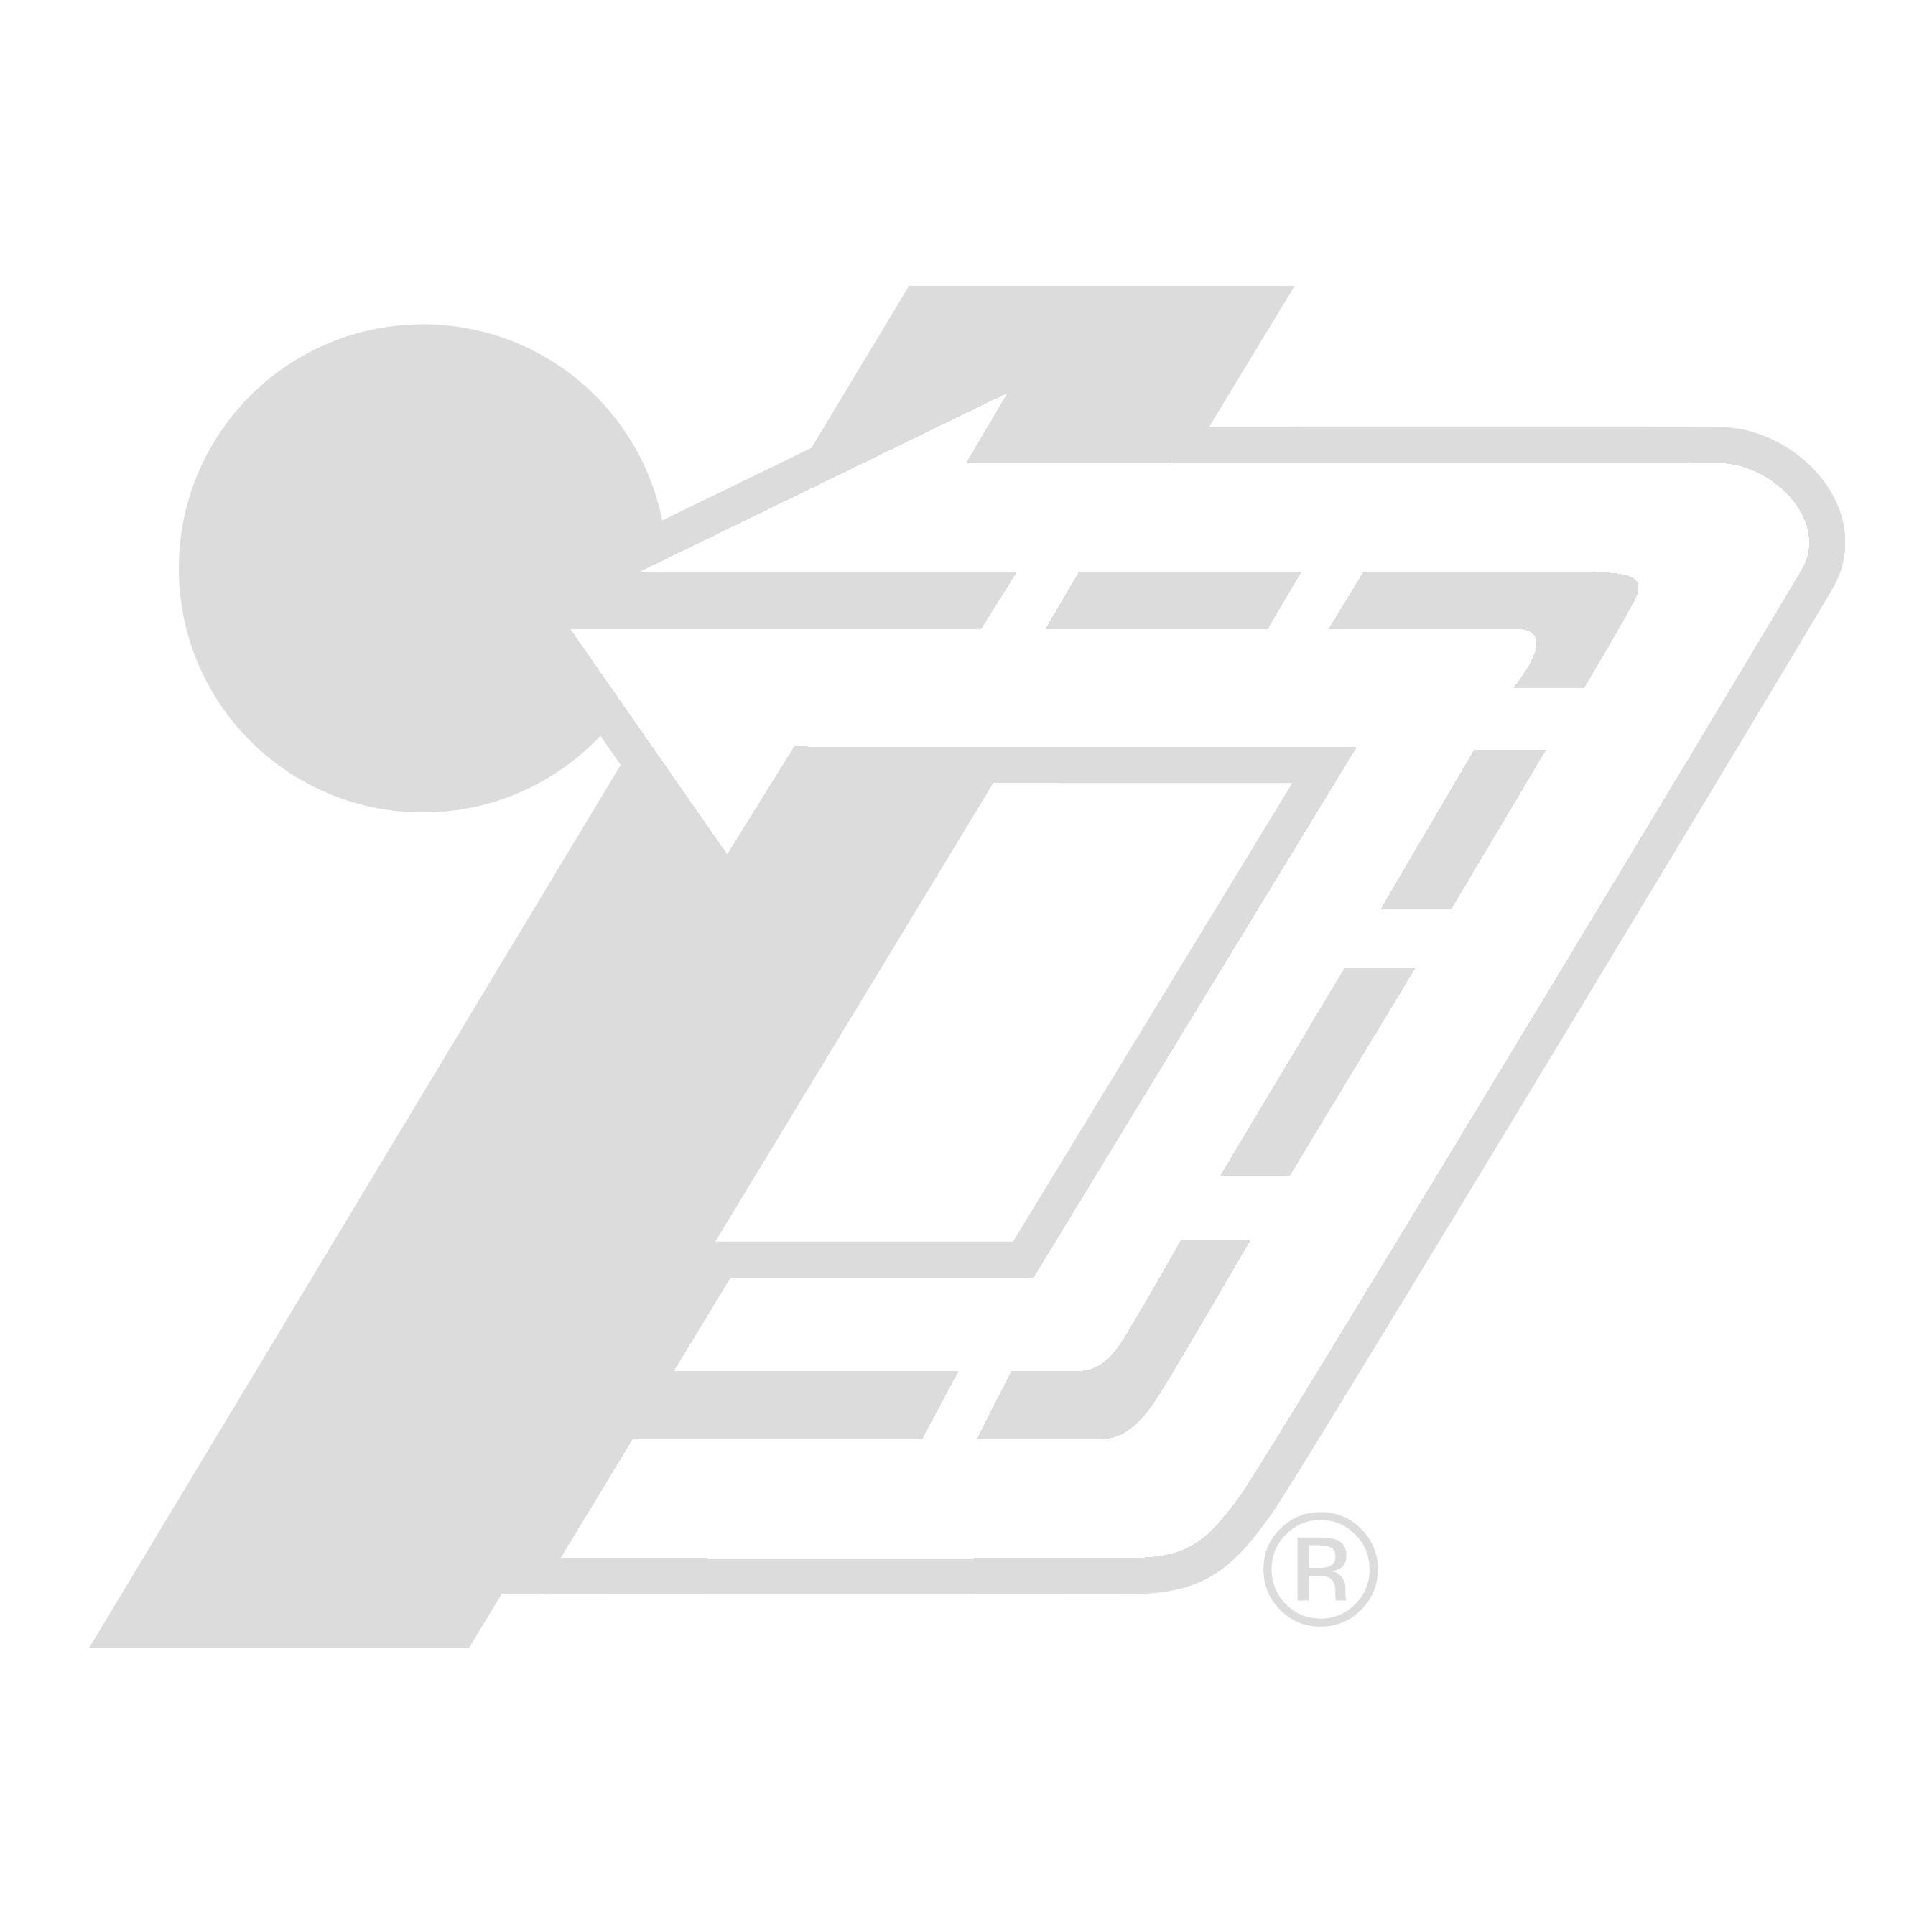 "Class II Mesh ANSI Lime Vest - (1) 2"" Horizontal & (2) 2"" Vertical Silver Reflective Stripes."